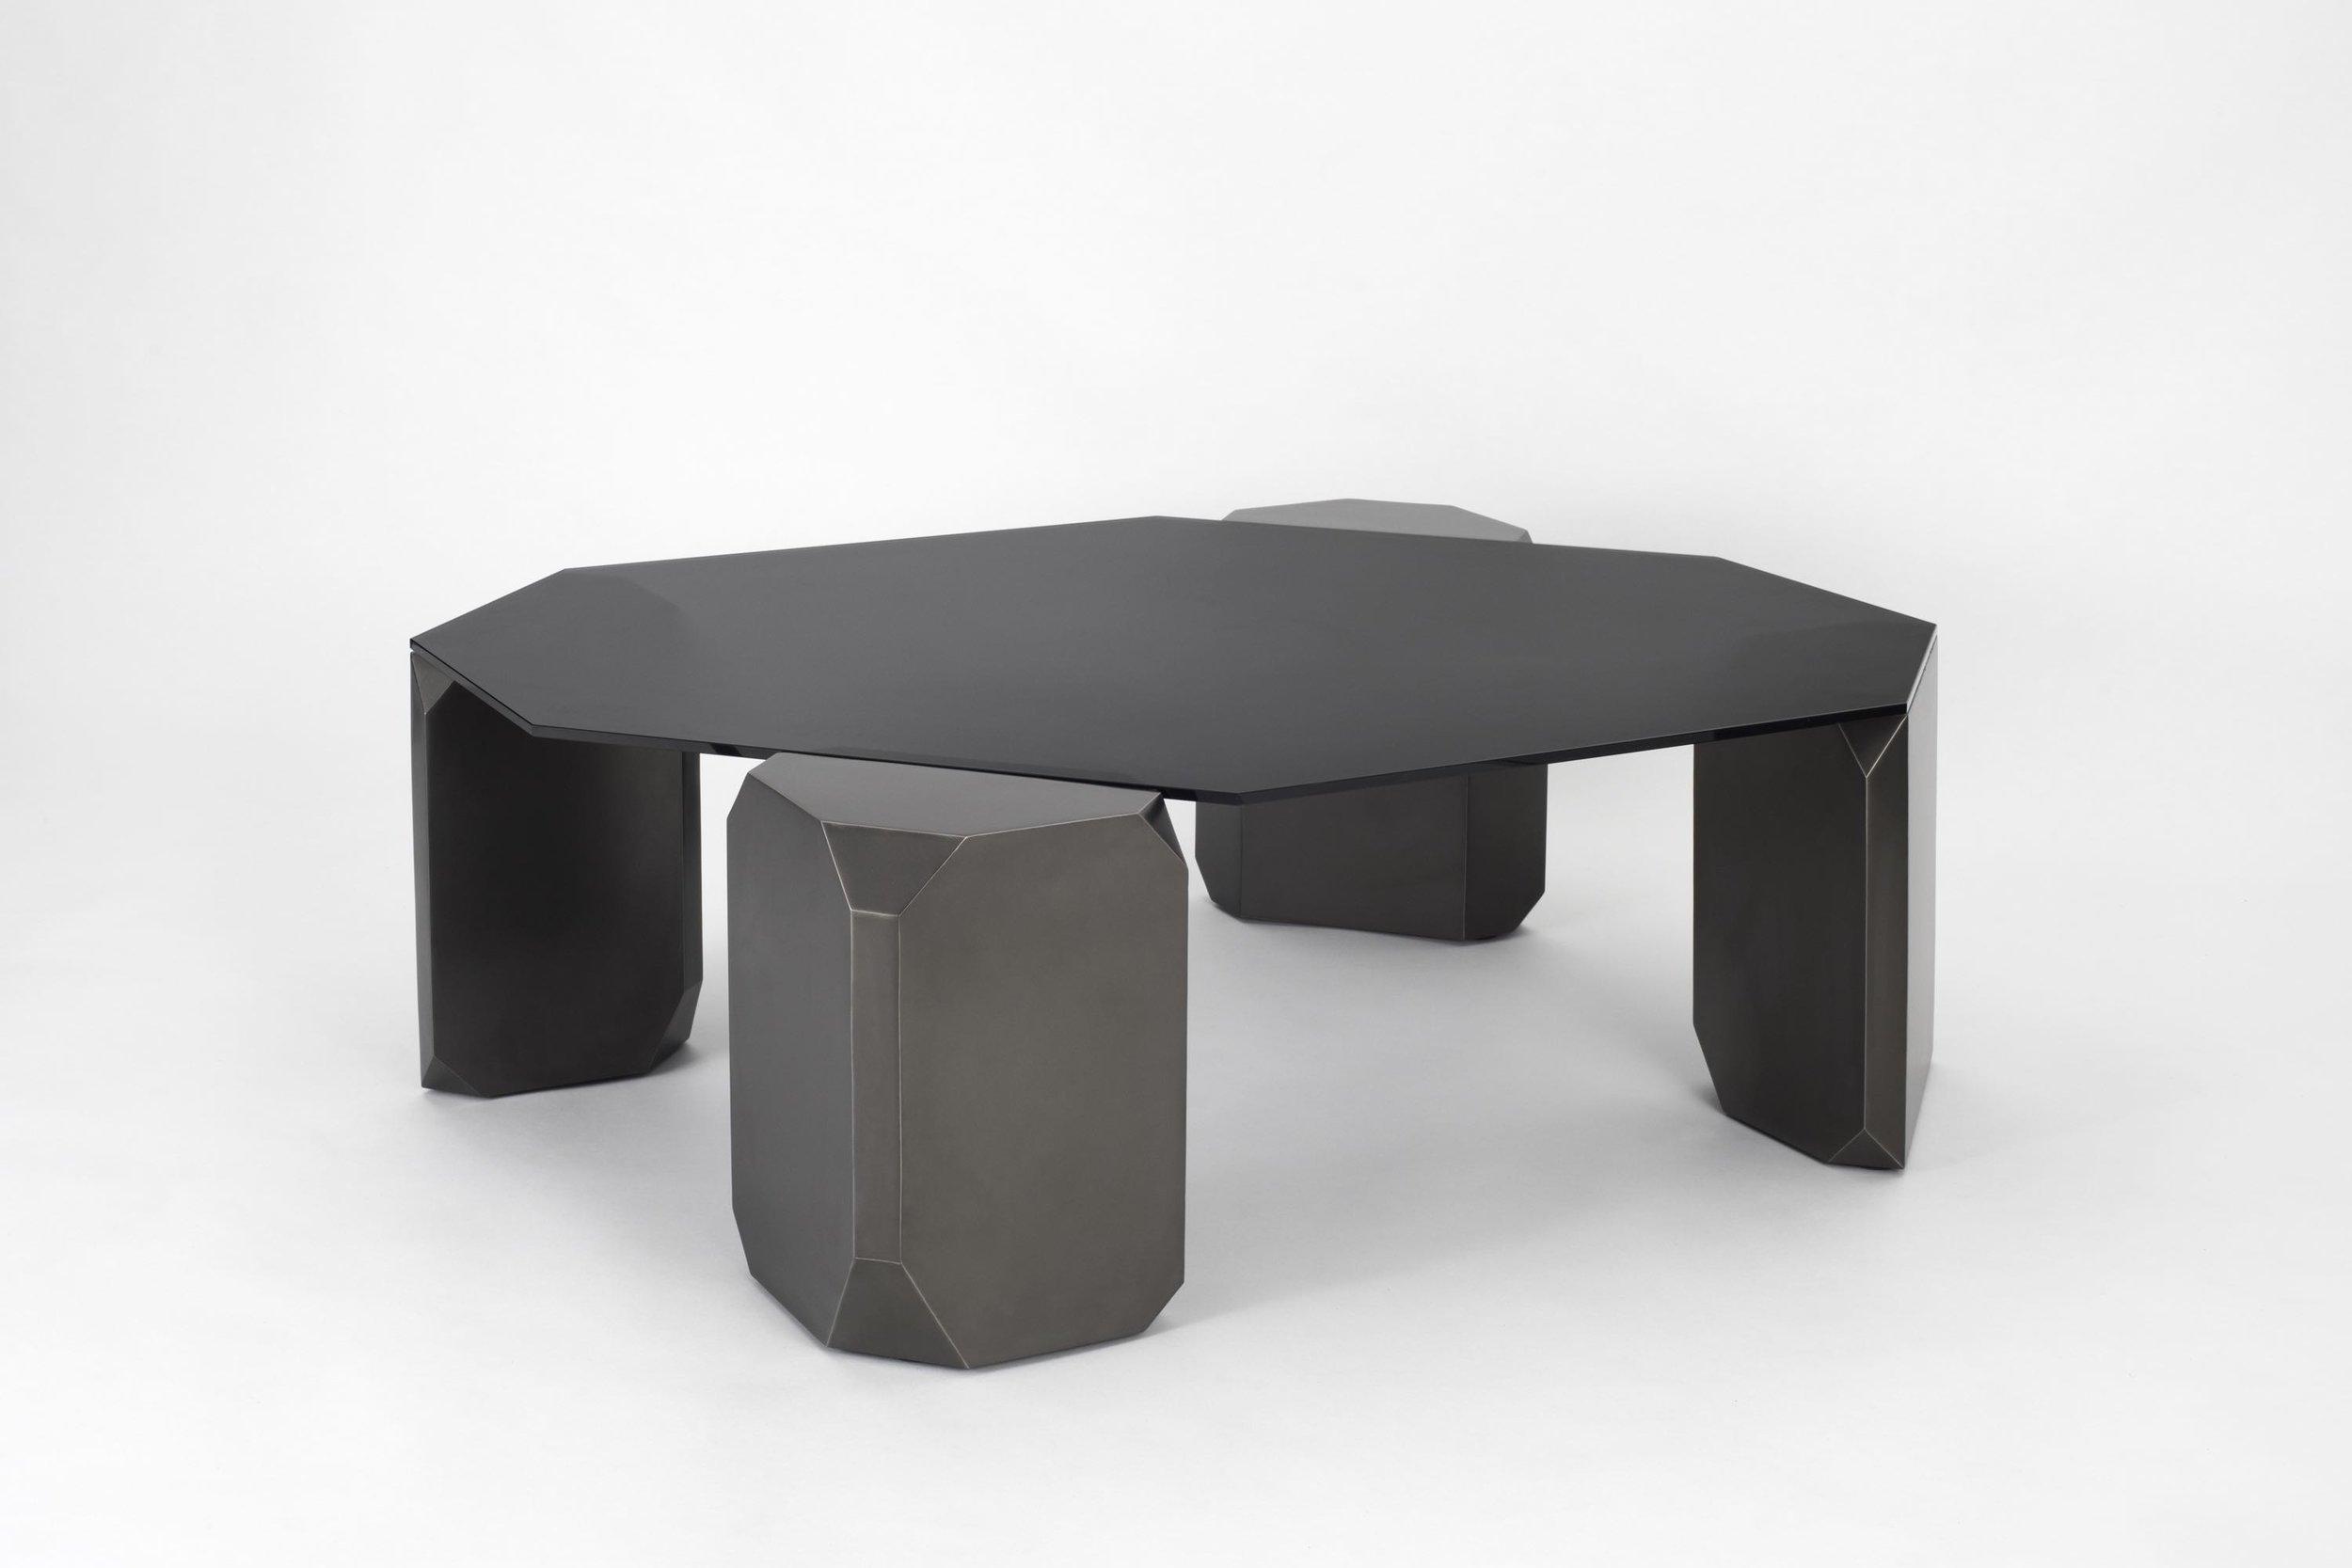 Avram_Rusu_Stonehenge_Coffee_Table_3.jpeg